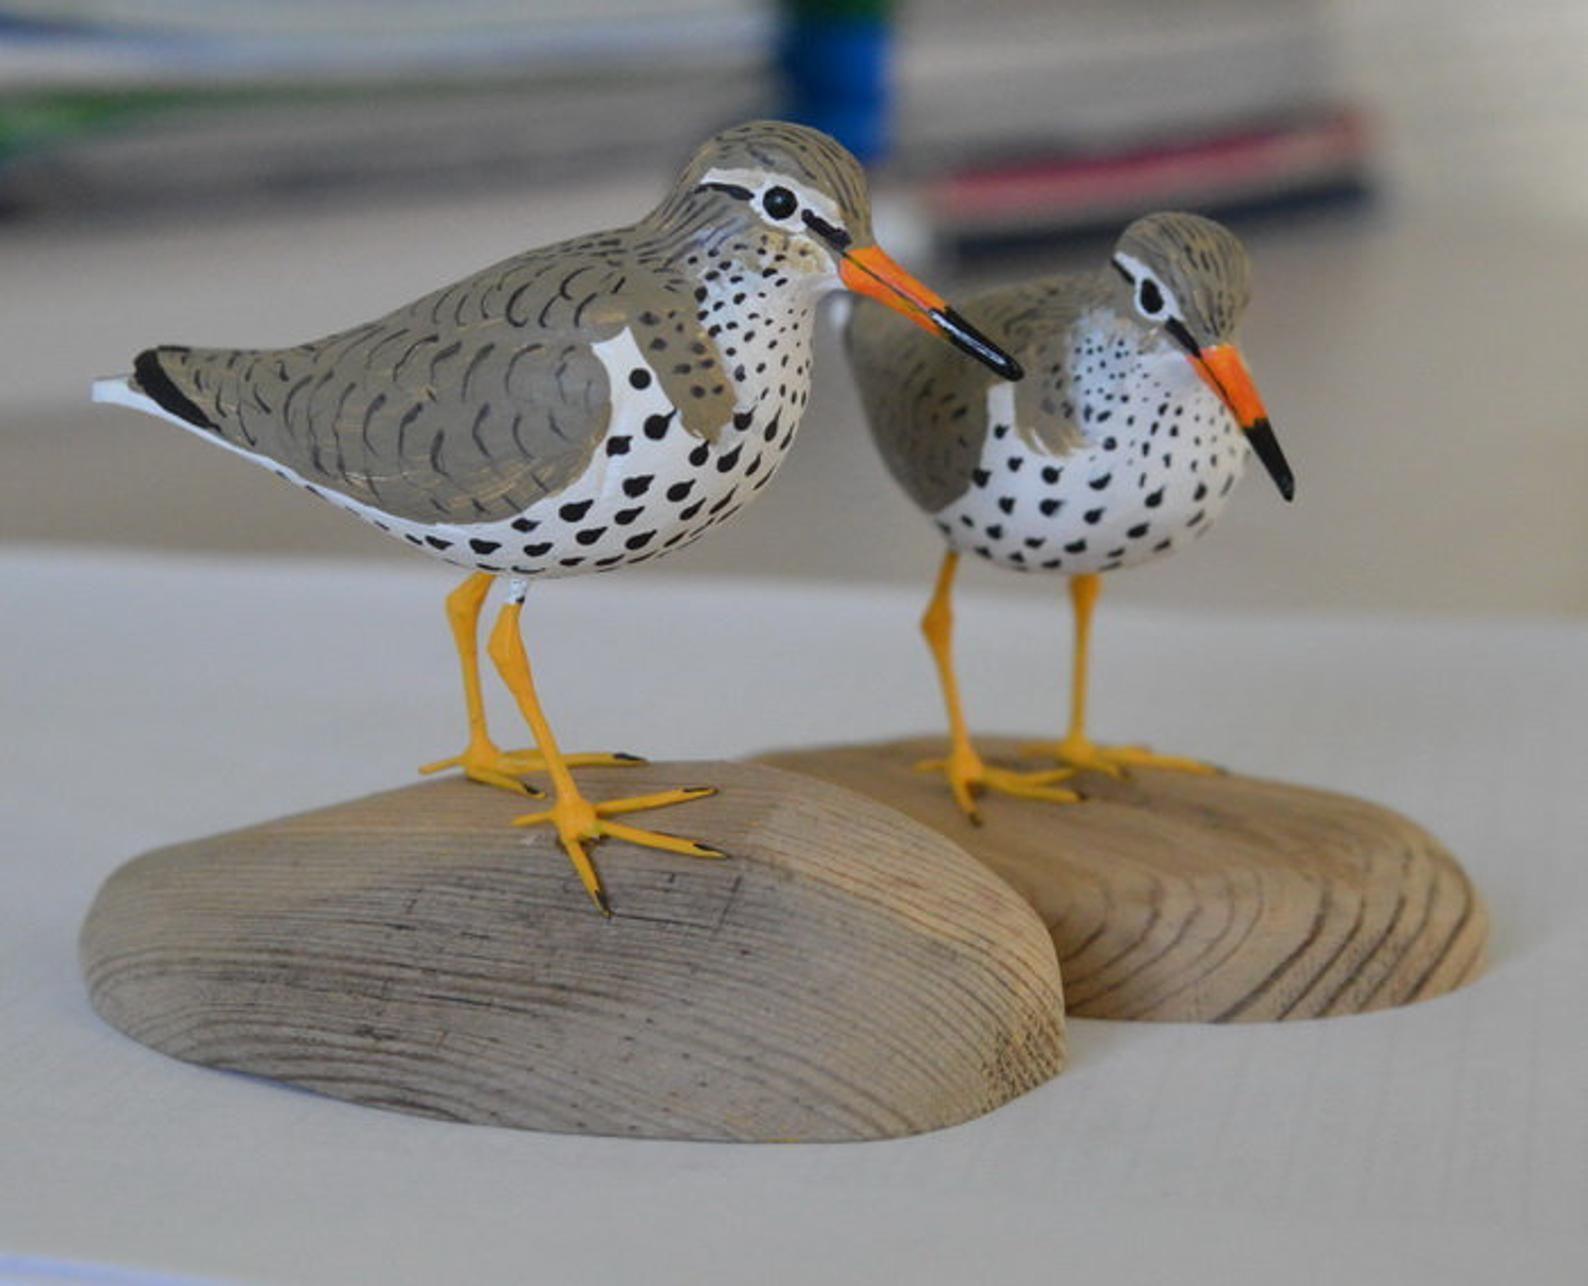 Spotted Sandpiper Shorebird Sculpture Actitis Macularius Etsy Sandpiper Wooden Figurines Shorebirds